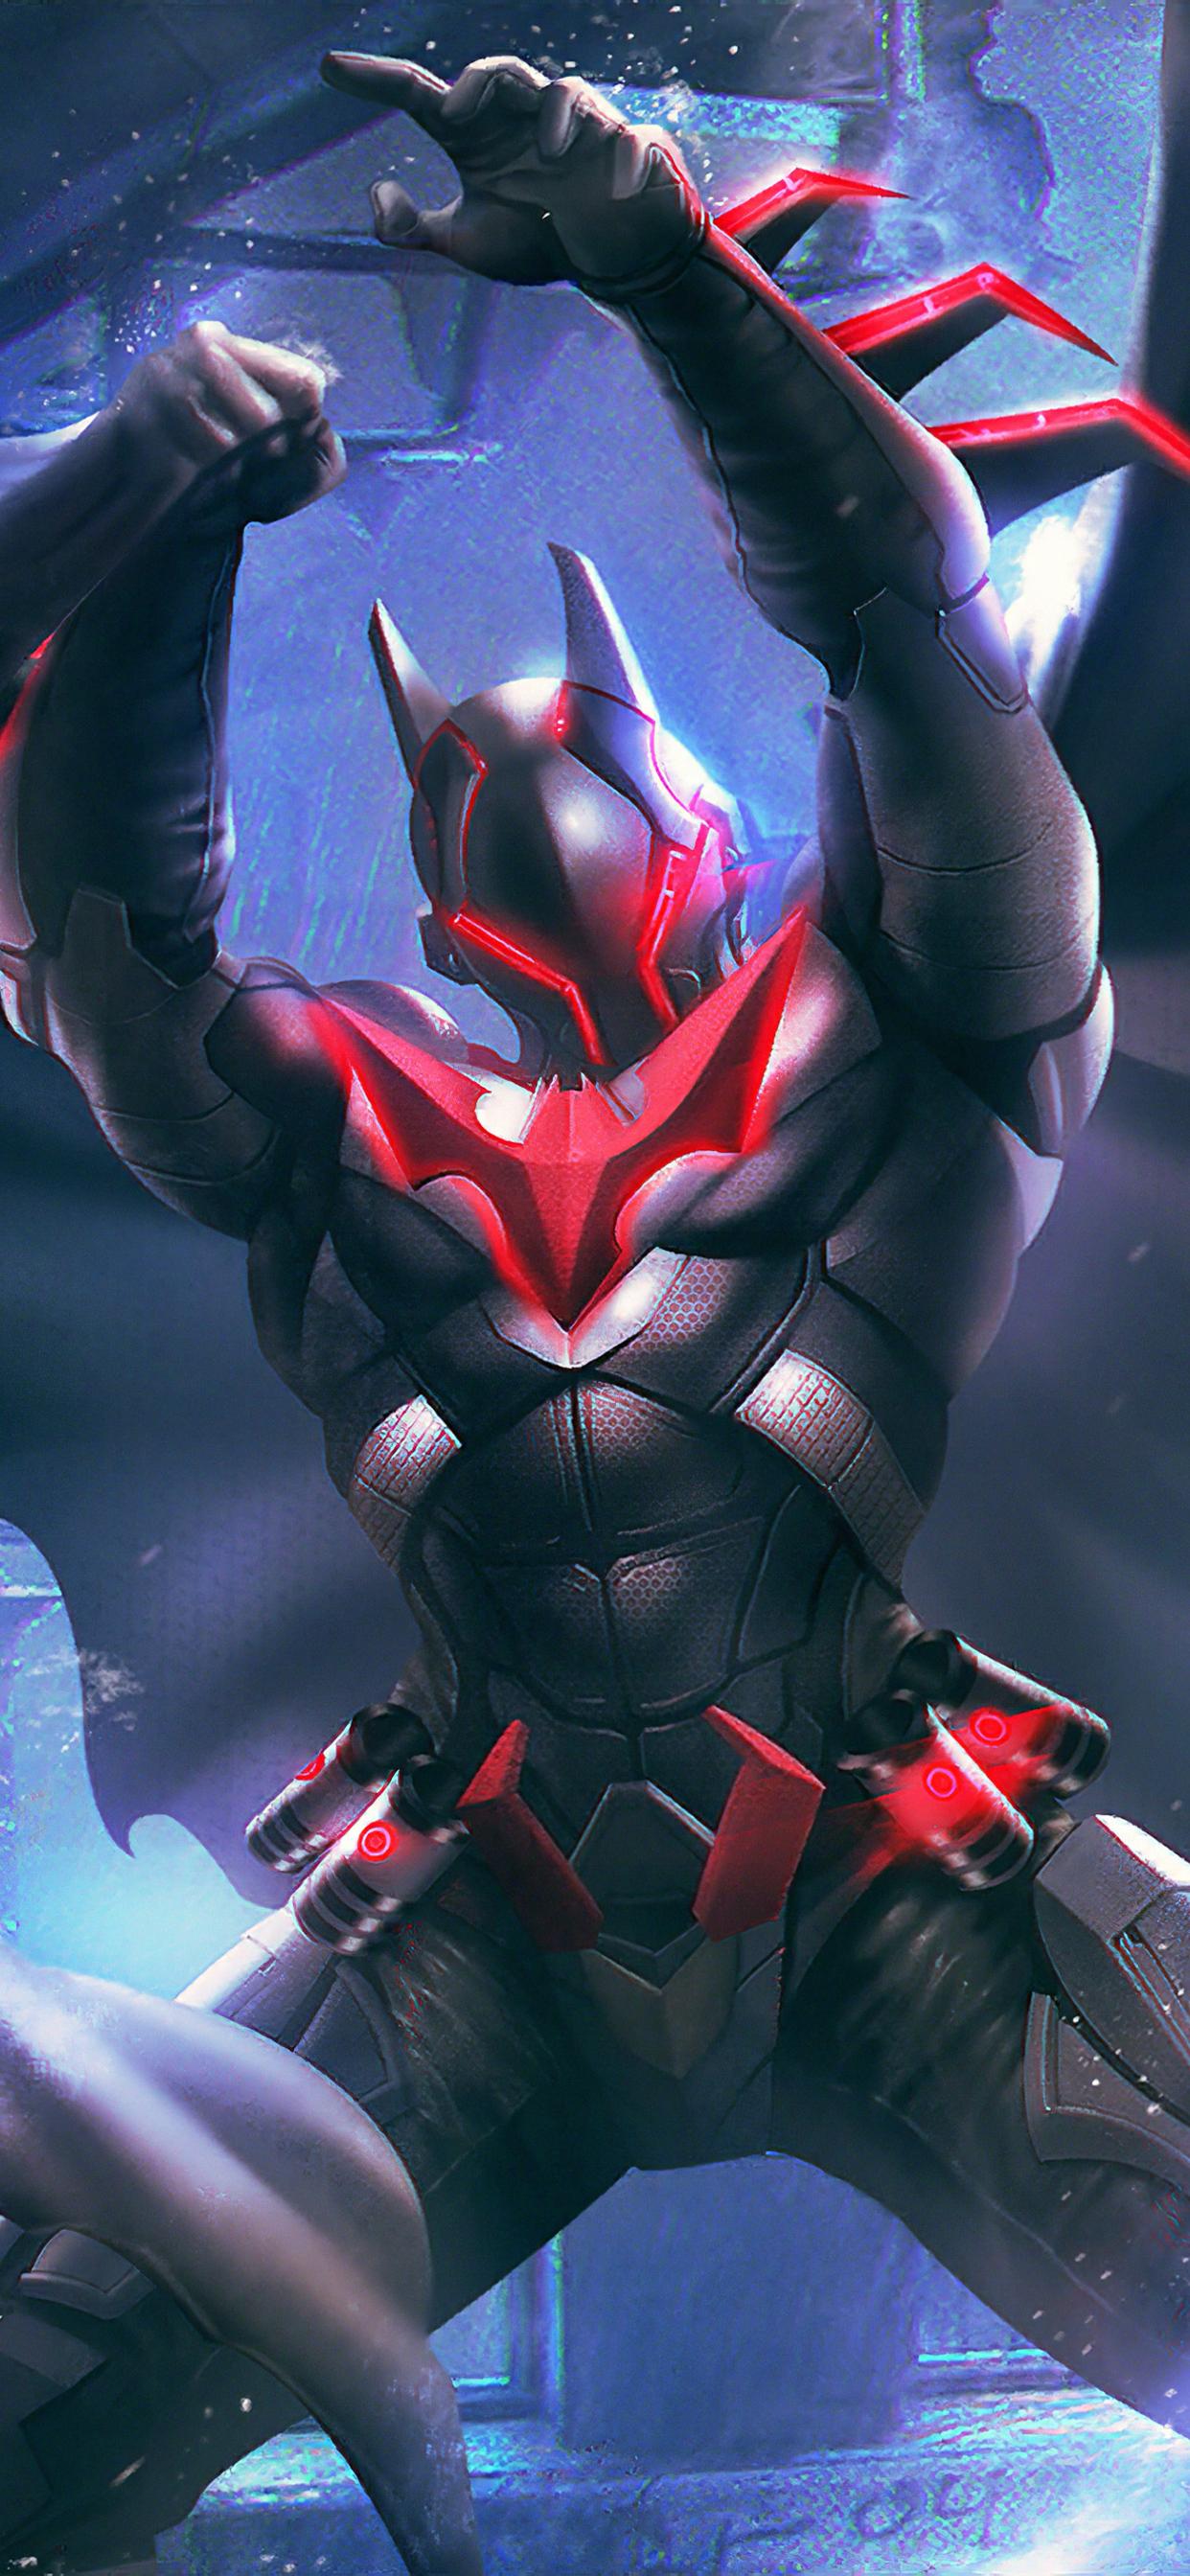 batman-beyond-artwork-new-md.jpg